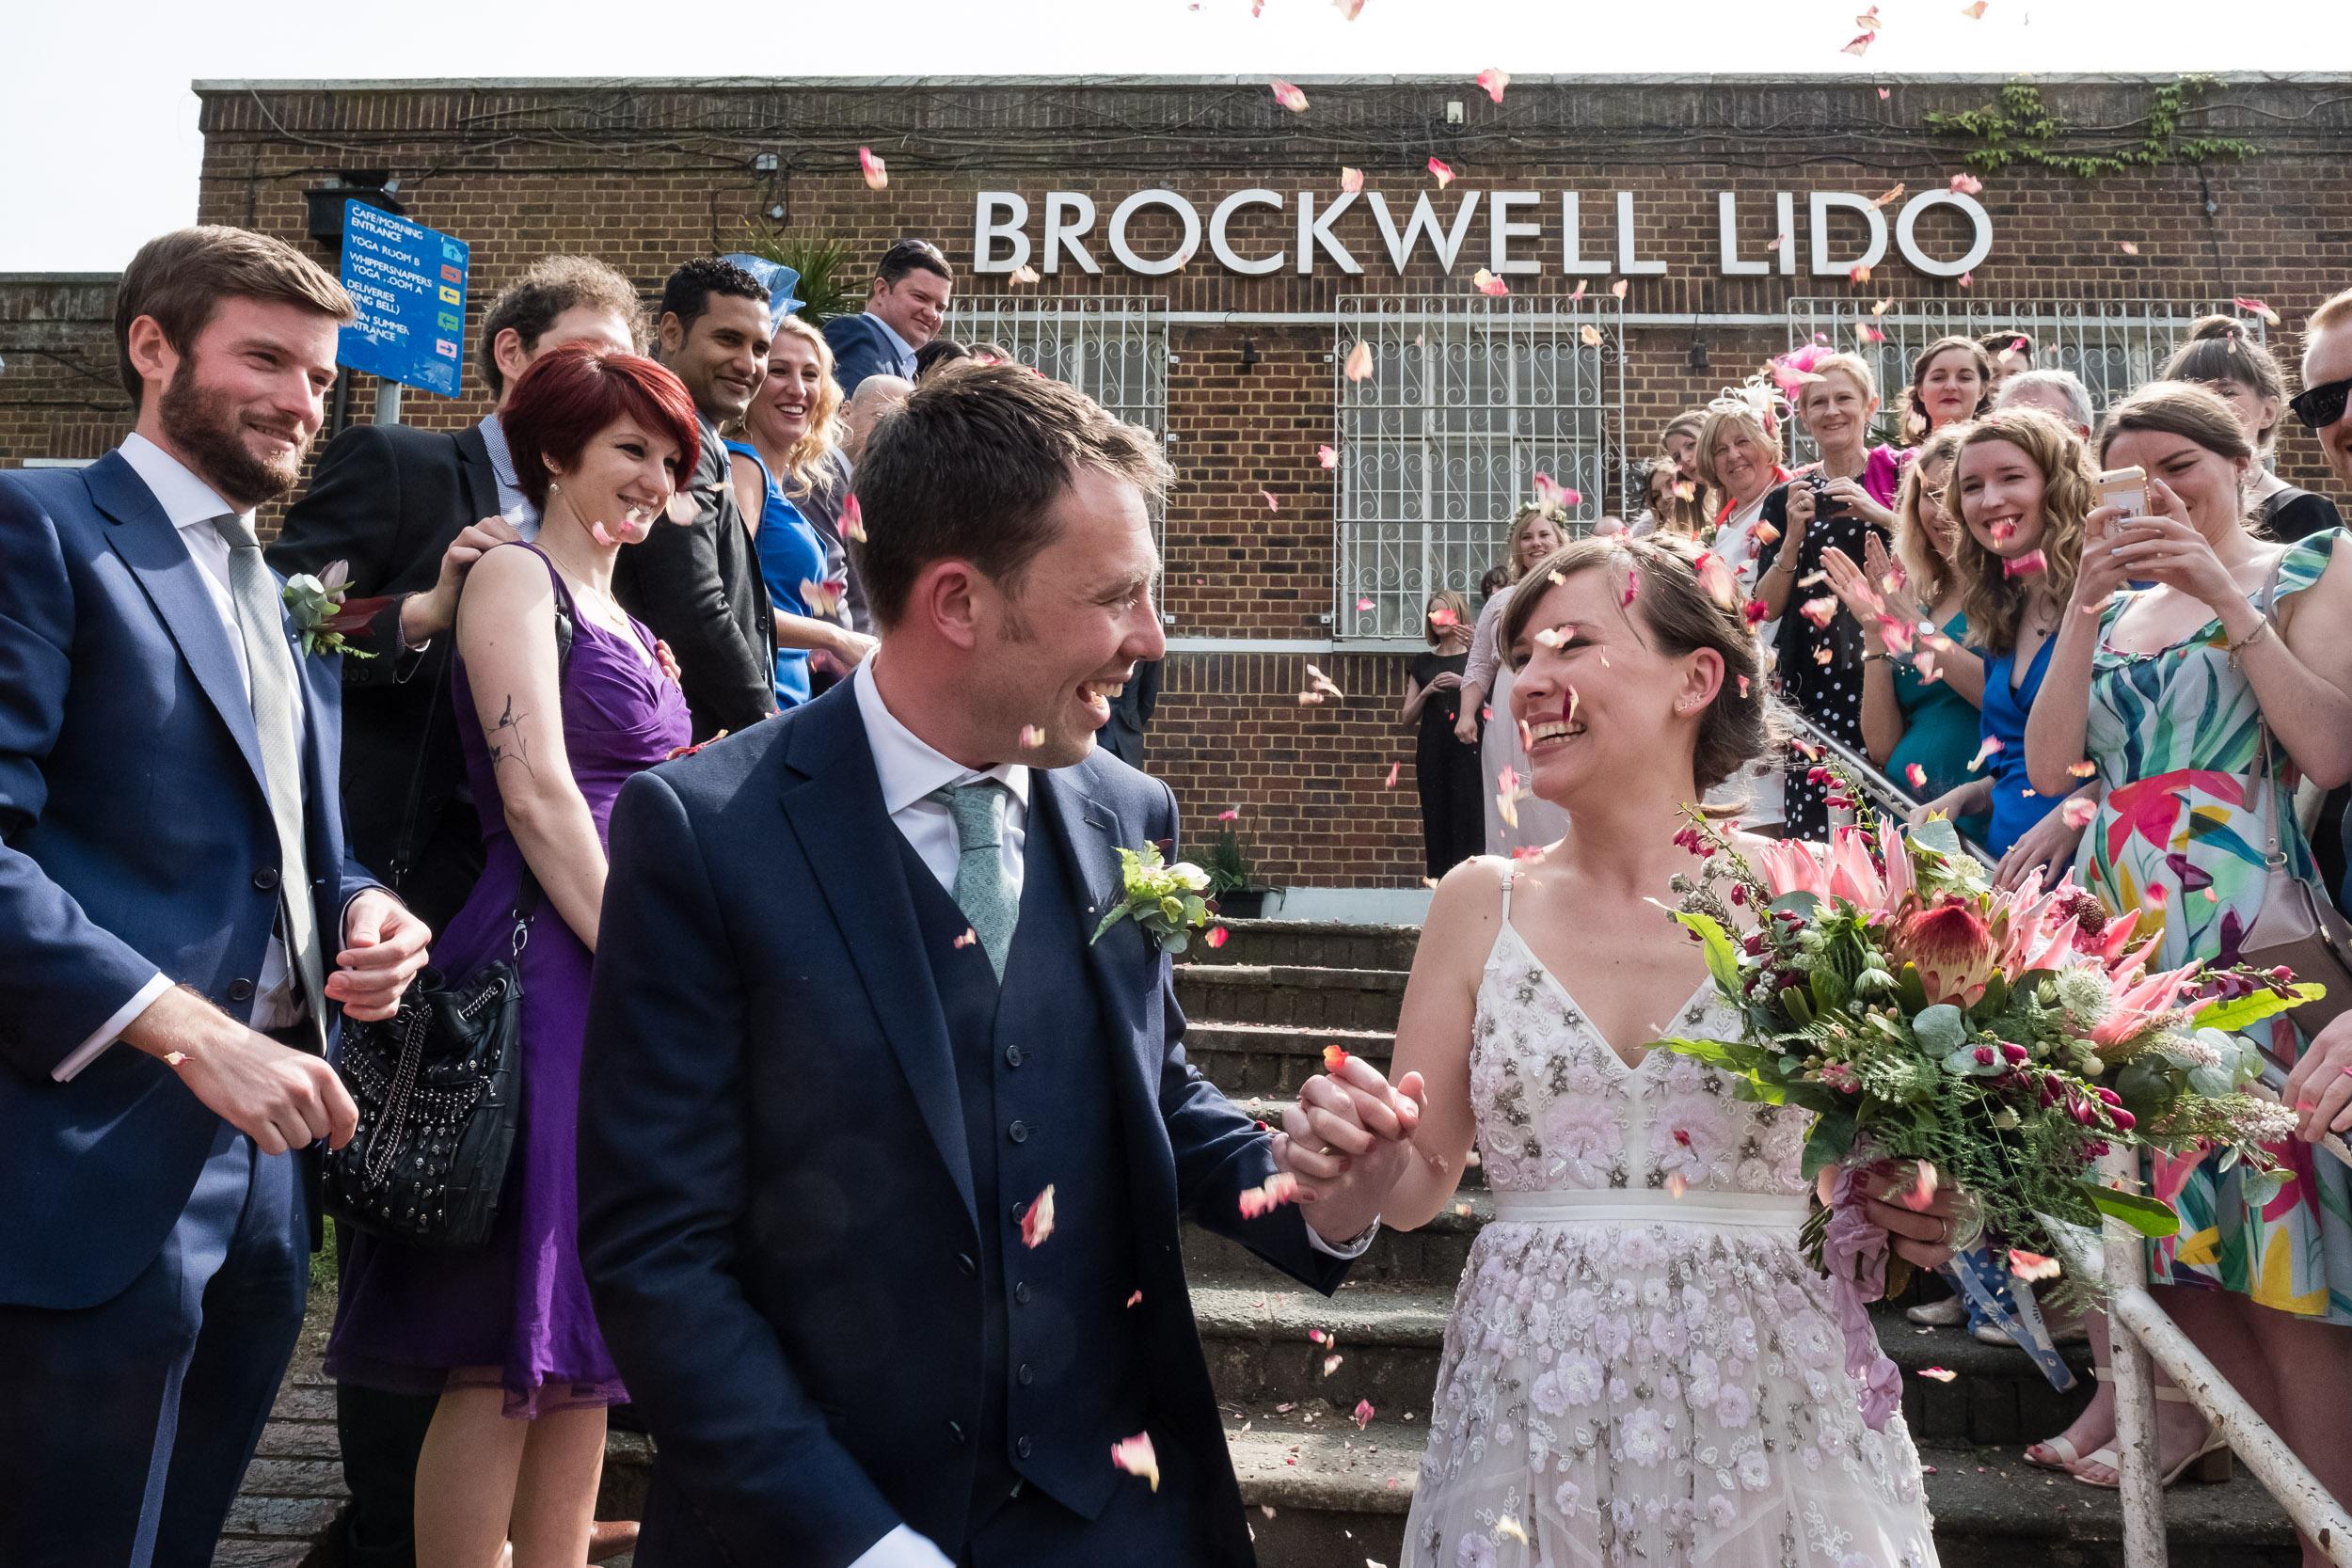 brockwell-lido-brixton-herne-hill-wedding-215.jpg